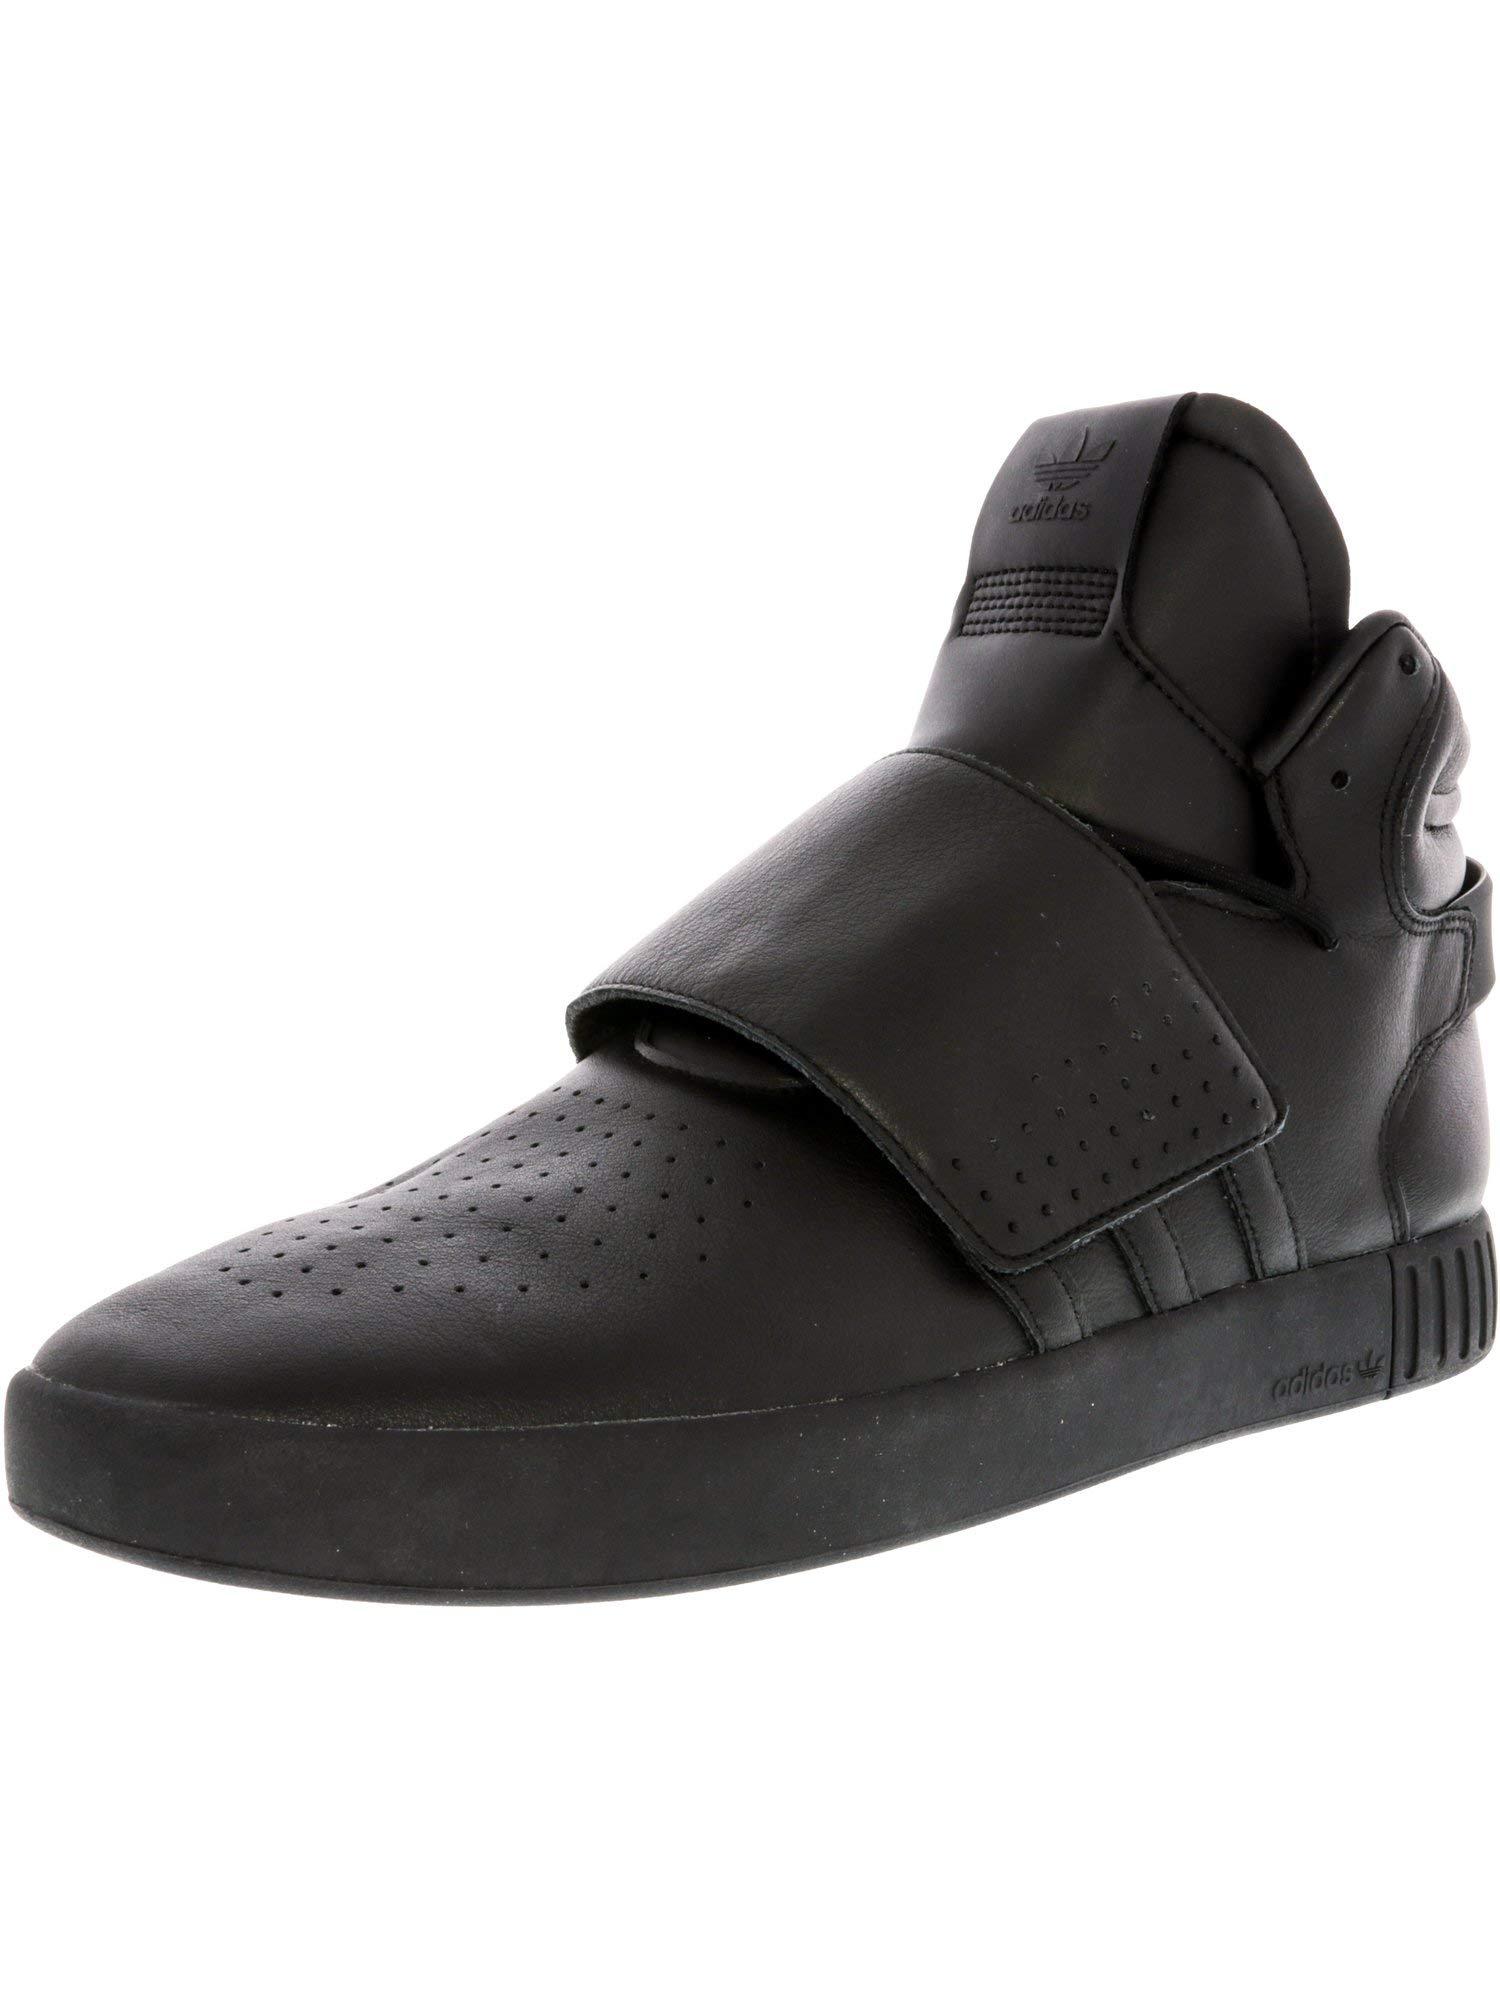 save off 53aca 2aee2 Galleon - Adidas Originals Men s Tubular Invader Strap Fashion Running Shoe,  Utility Black Fabric, (9 M US)